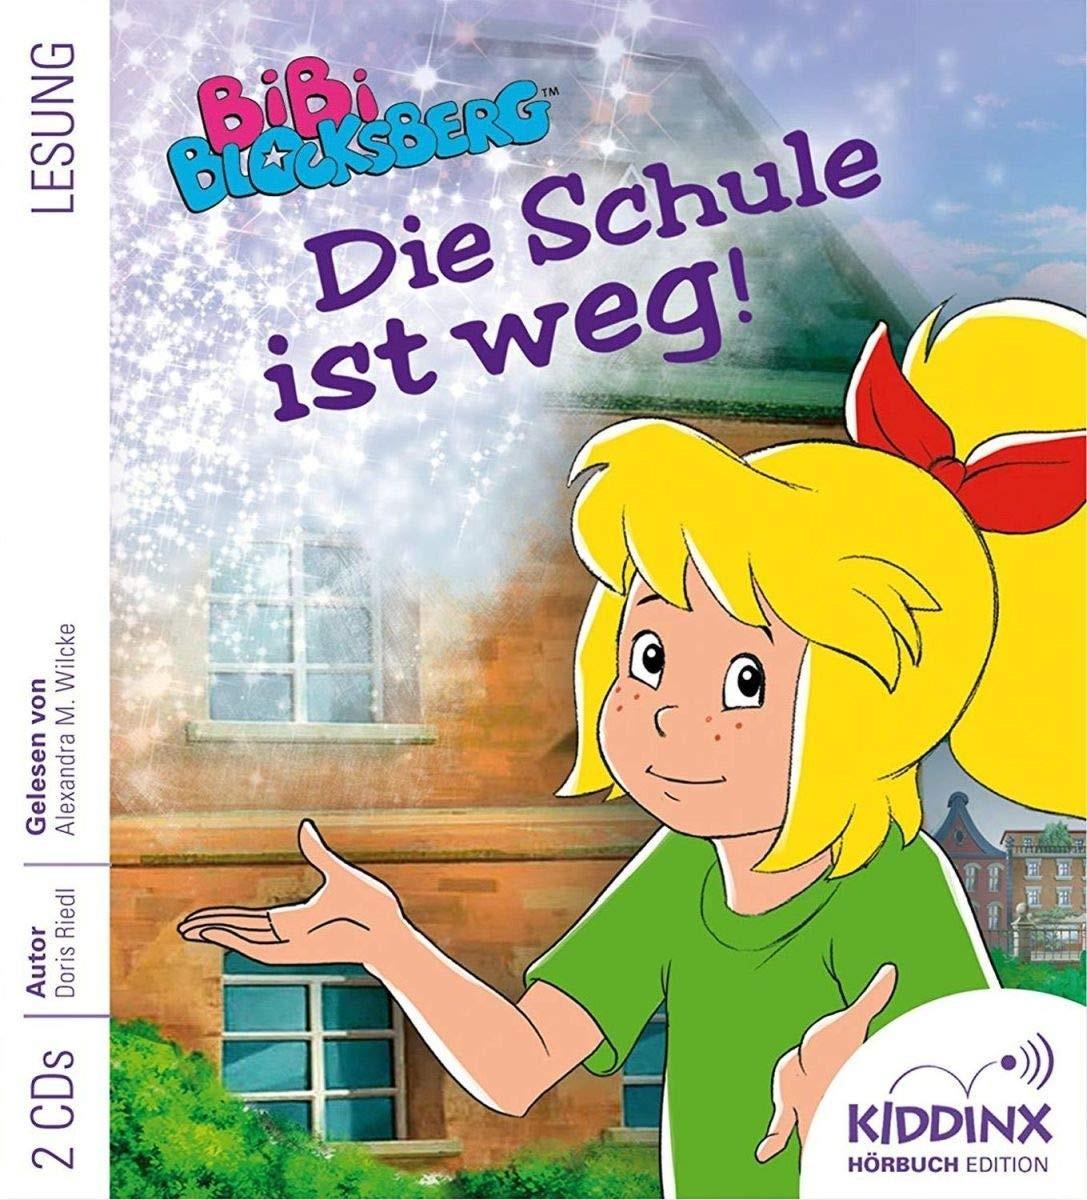 Bibi Blocksberg Hörbuch - Die Schule Ist Weg